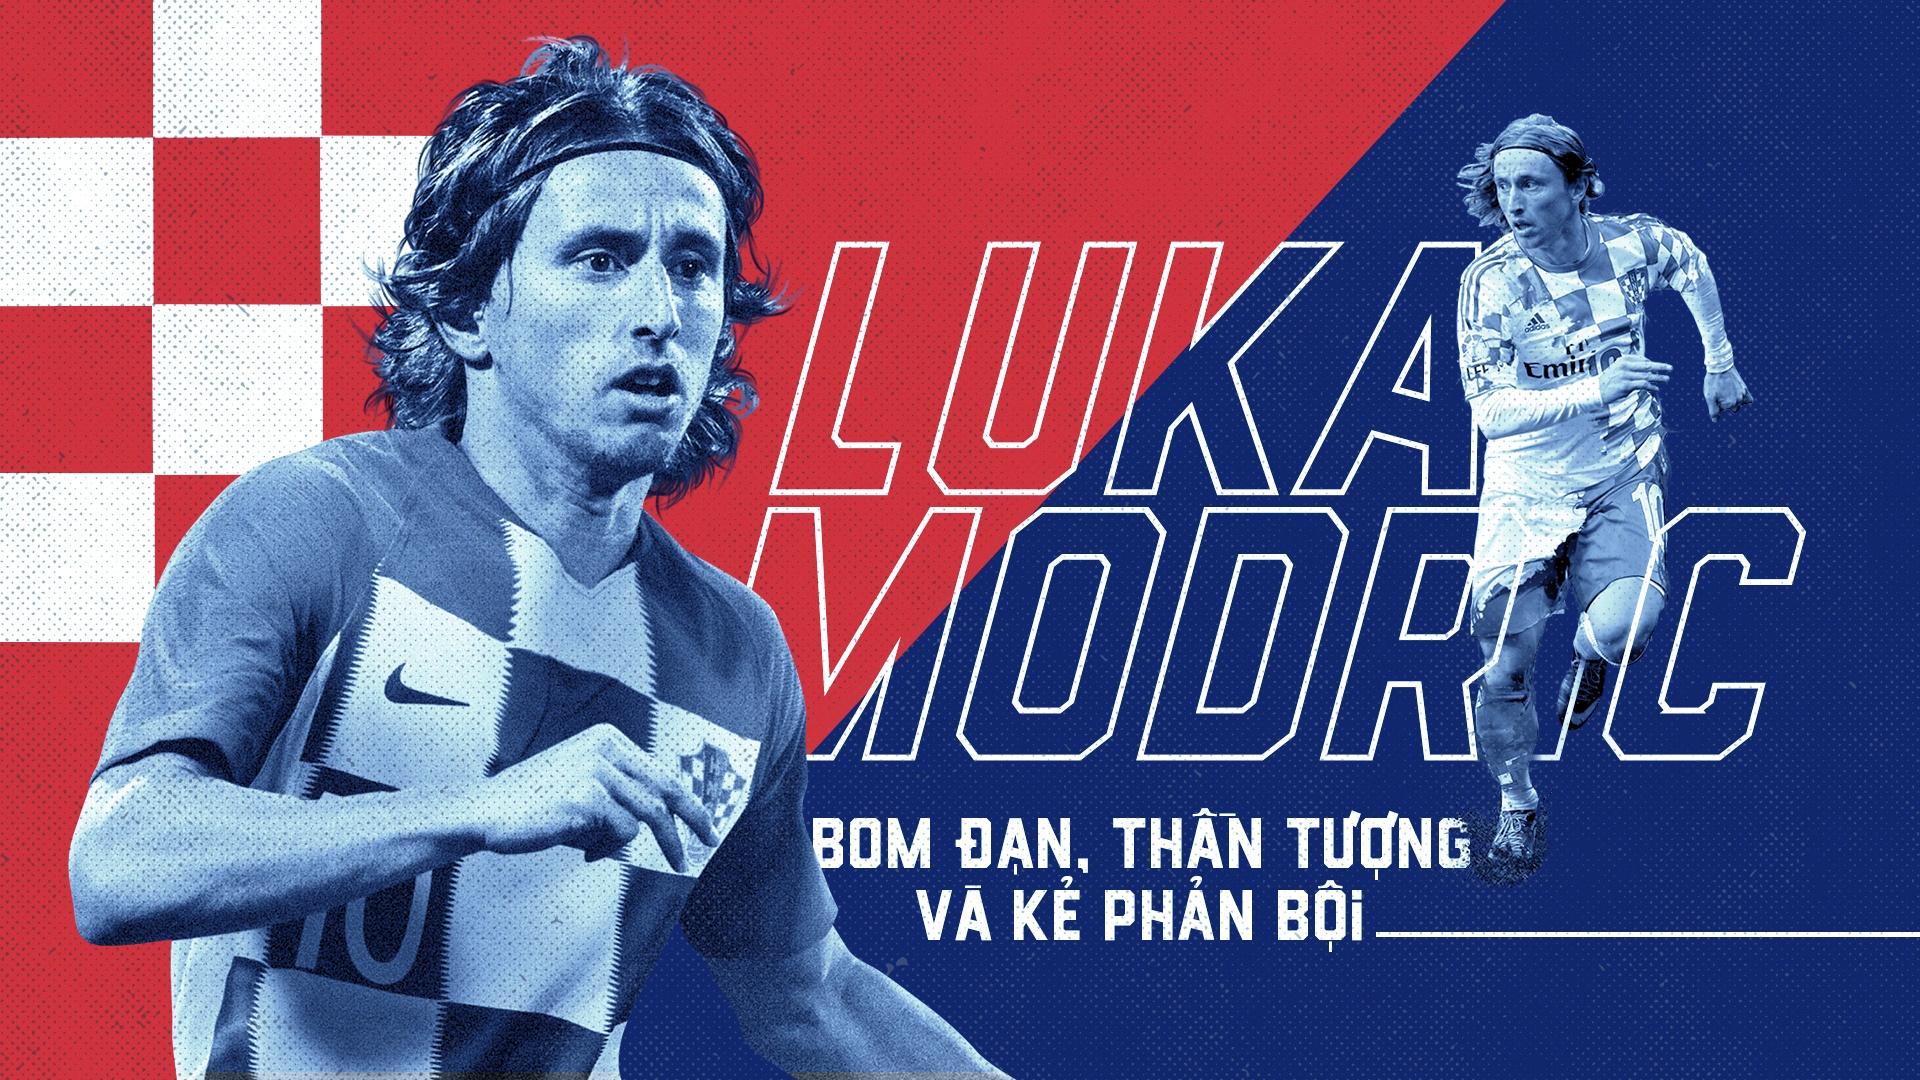 Luka Modric - ke phan boi va tam ve chung ket World Cup hinh anh 2